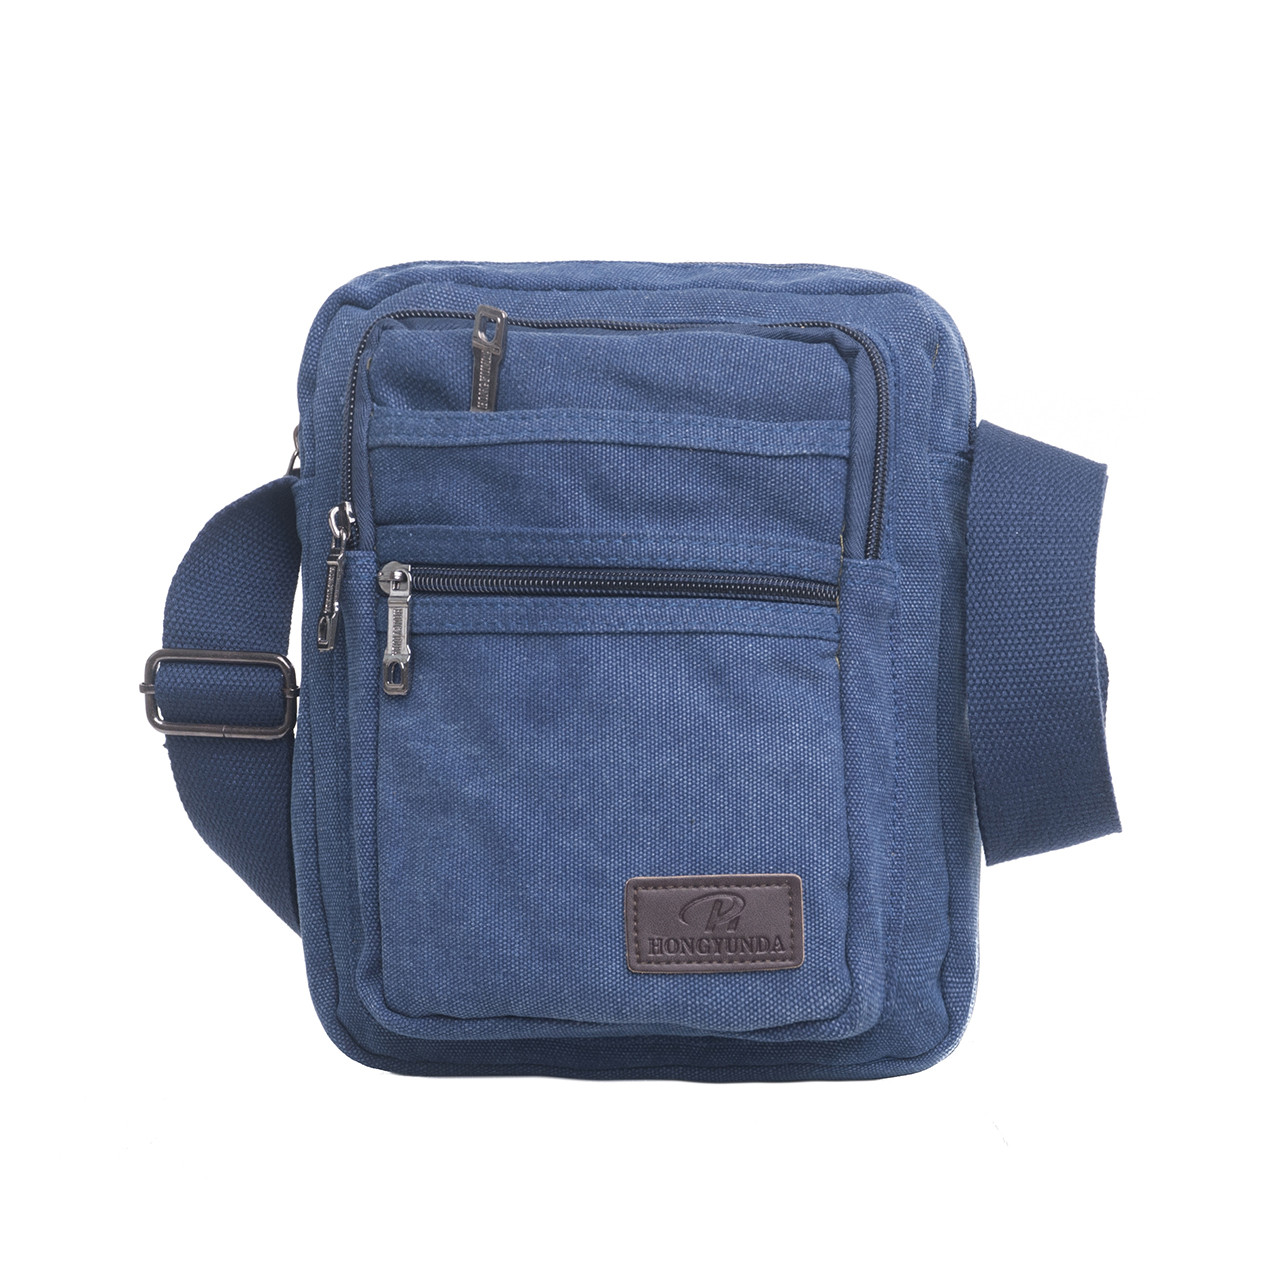 Мужская сумка HONGYUNDA вертикальная, 18х23х9 ткань брезент ксФ1518син